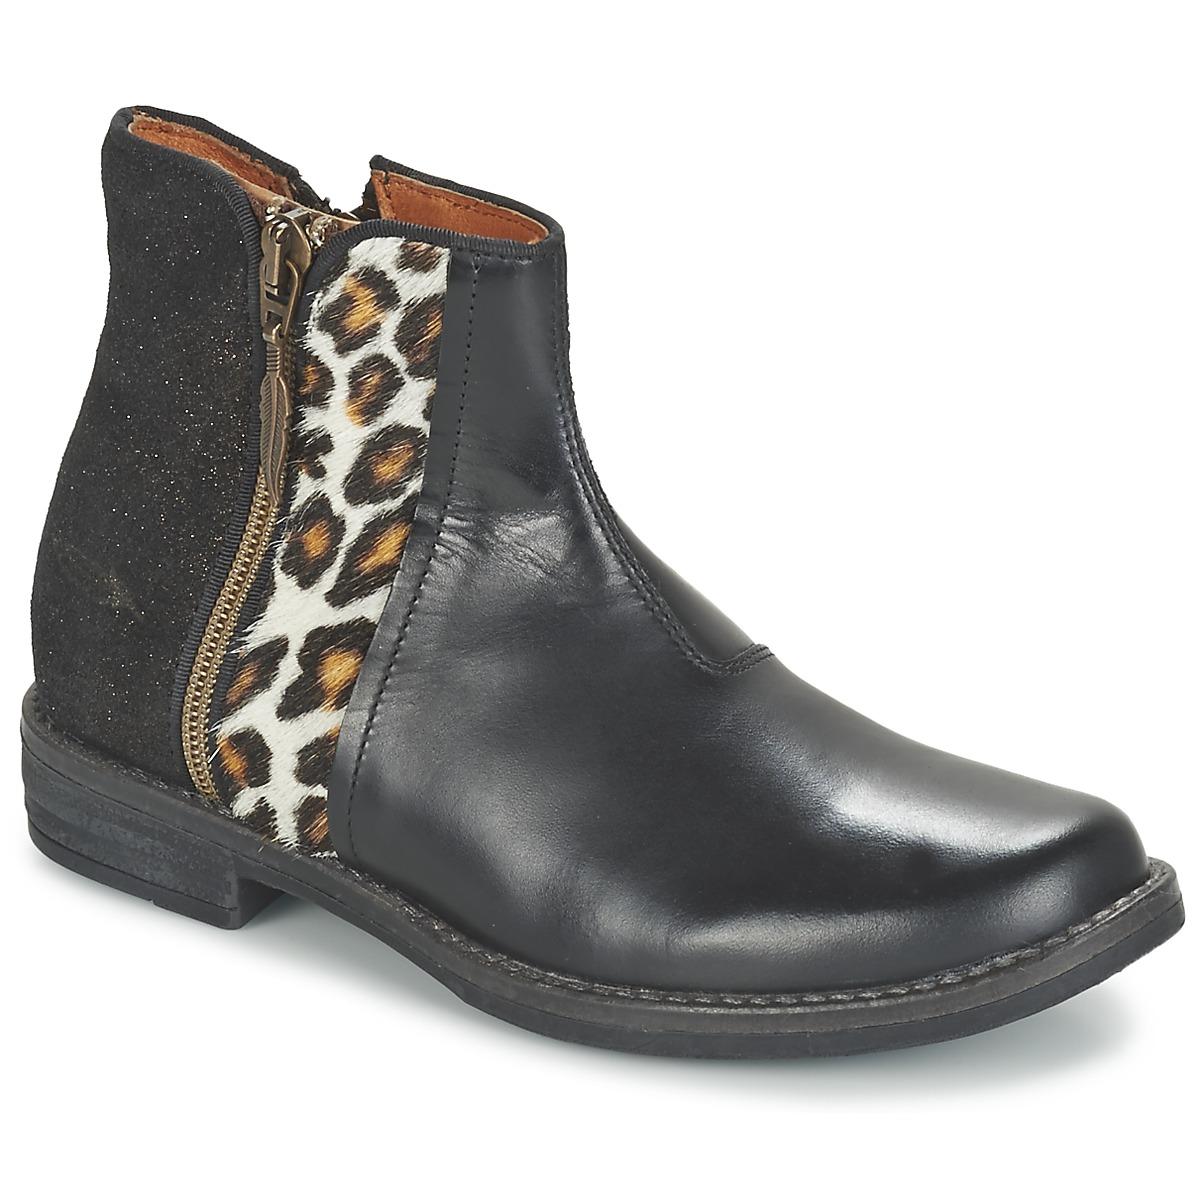 Støvler til børn Shwik  TIJUANA WILD